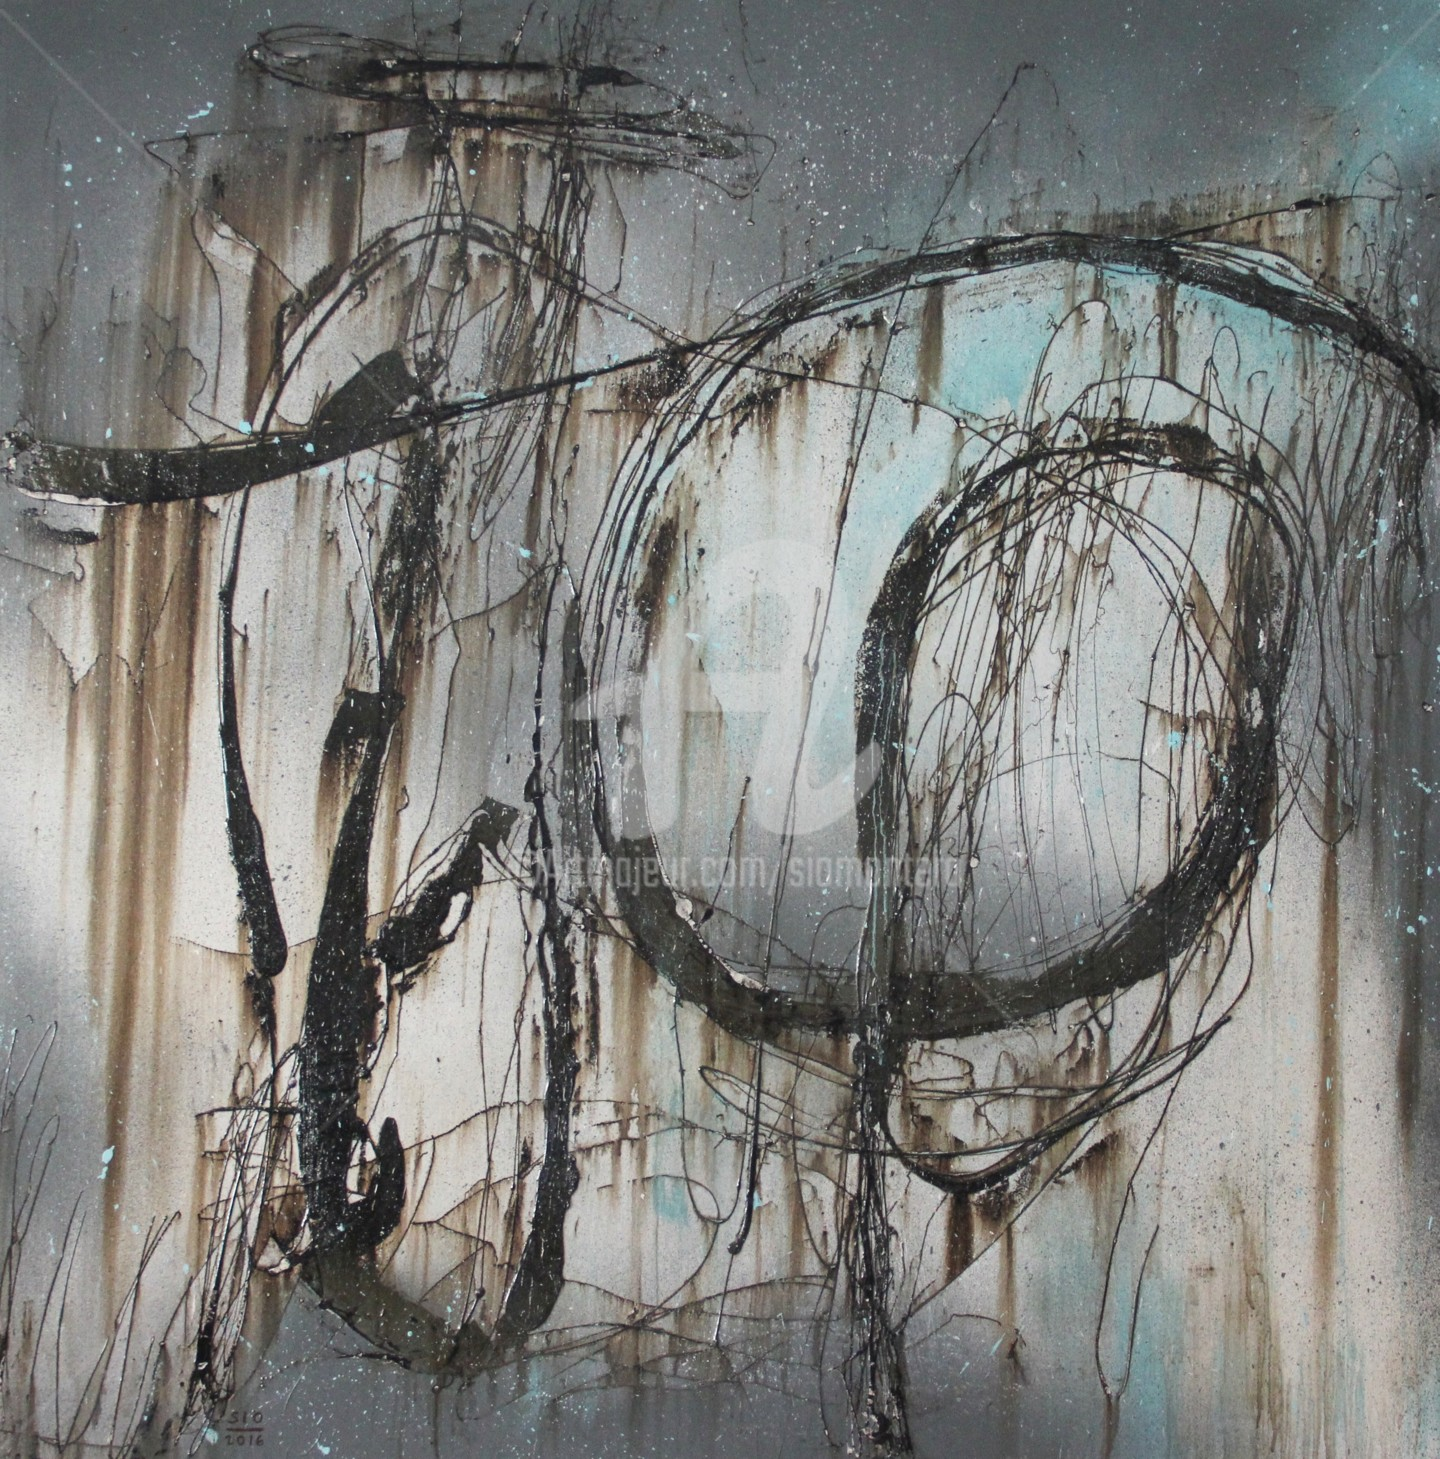 Sio Montera - Untitled